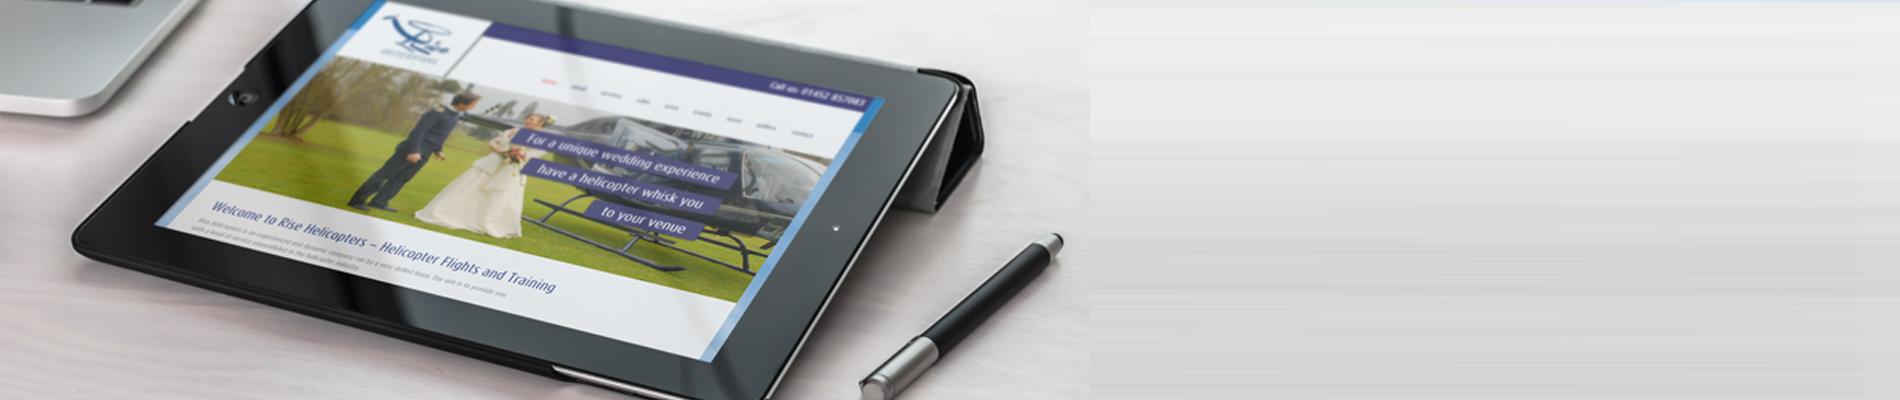 website-design-responsive-design-gloucester-slider2